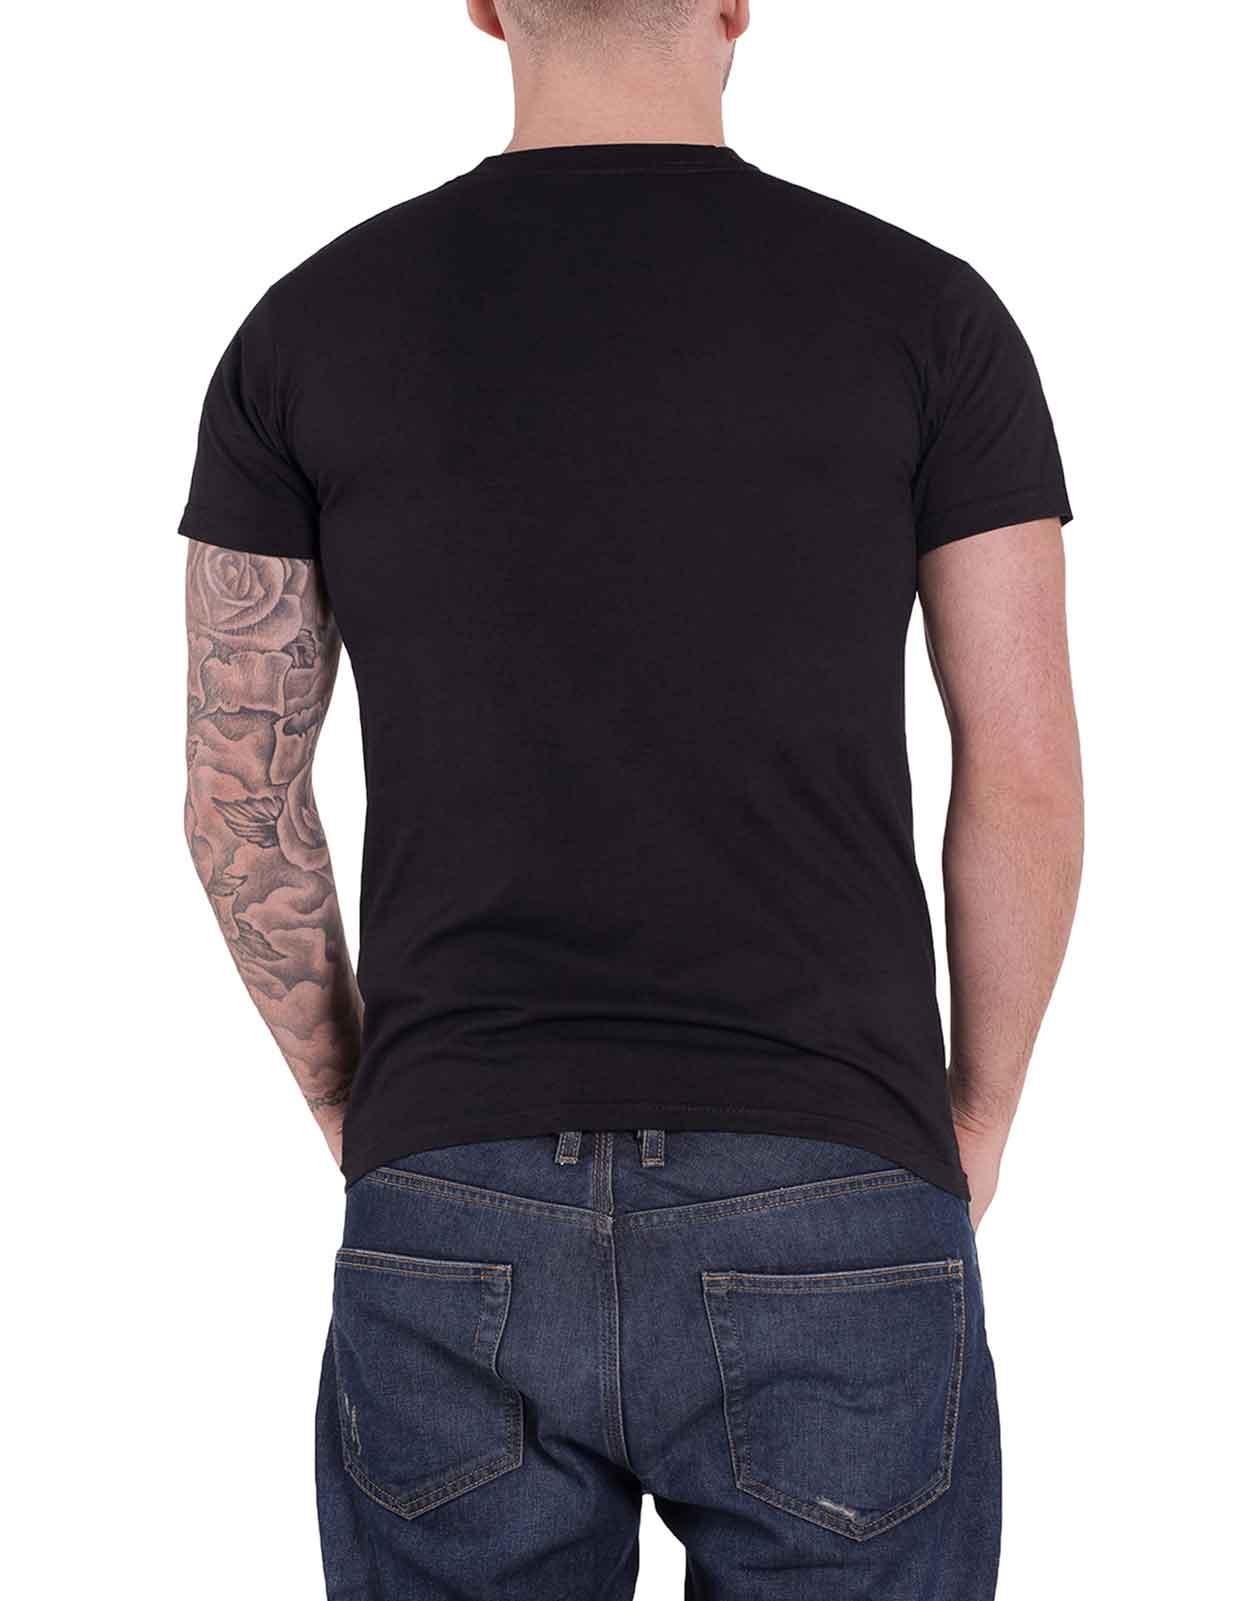 Misfits-T-Shirt-Official-fiend-Skull-Band-Logo-Die-Die-My-Darling-Mens-New thumbnail 5